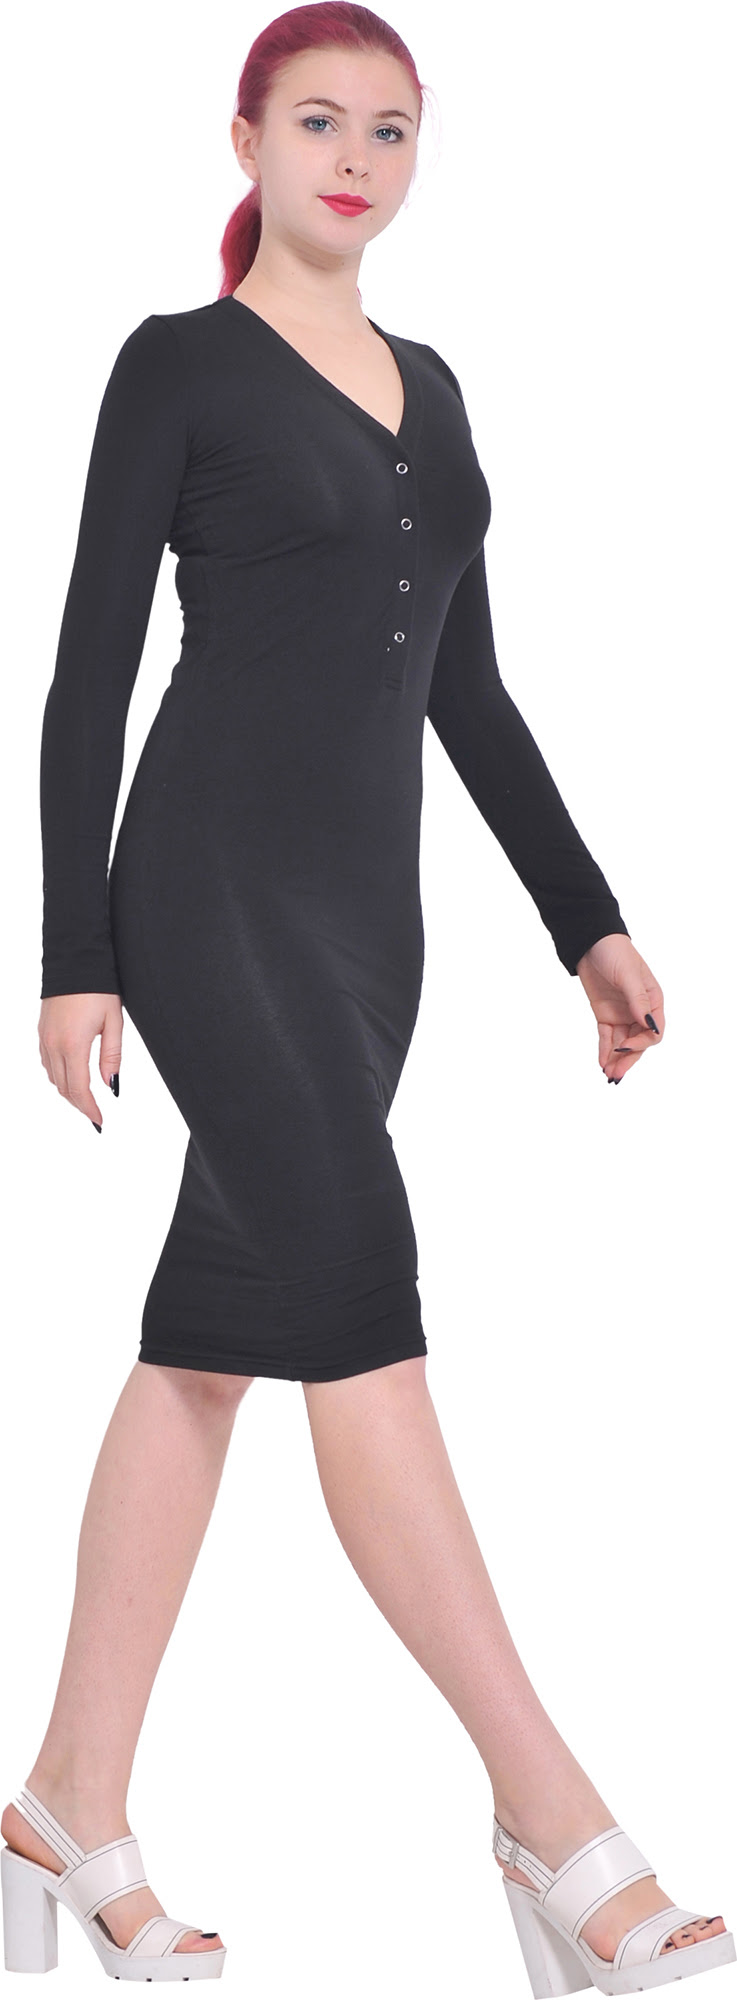 Bodycon length dress knee sleeve long jones